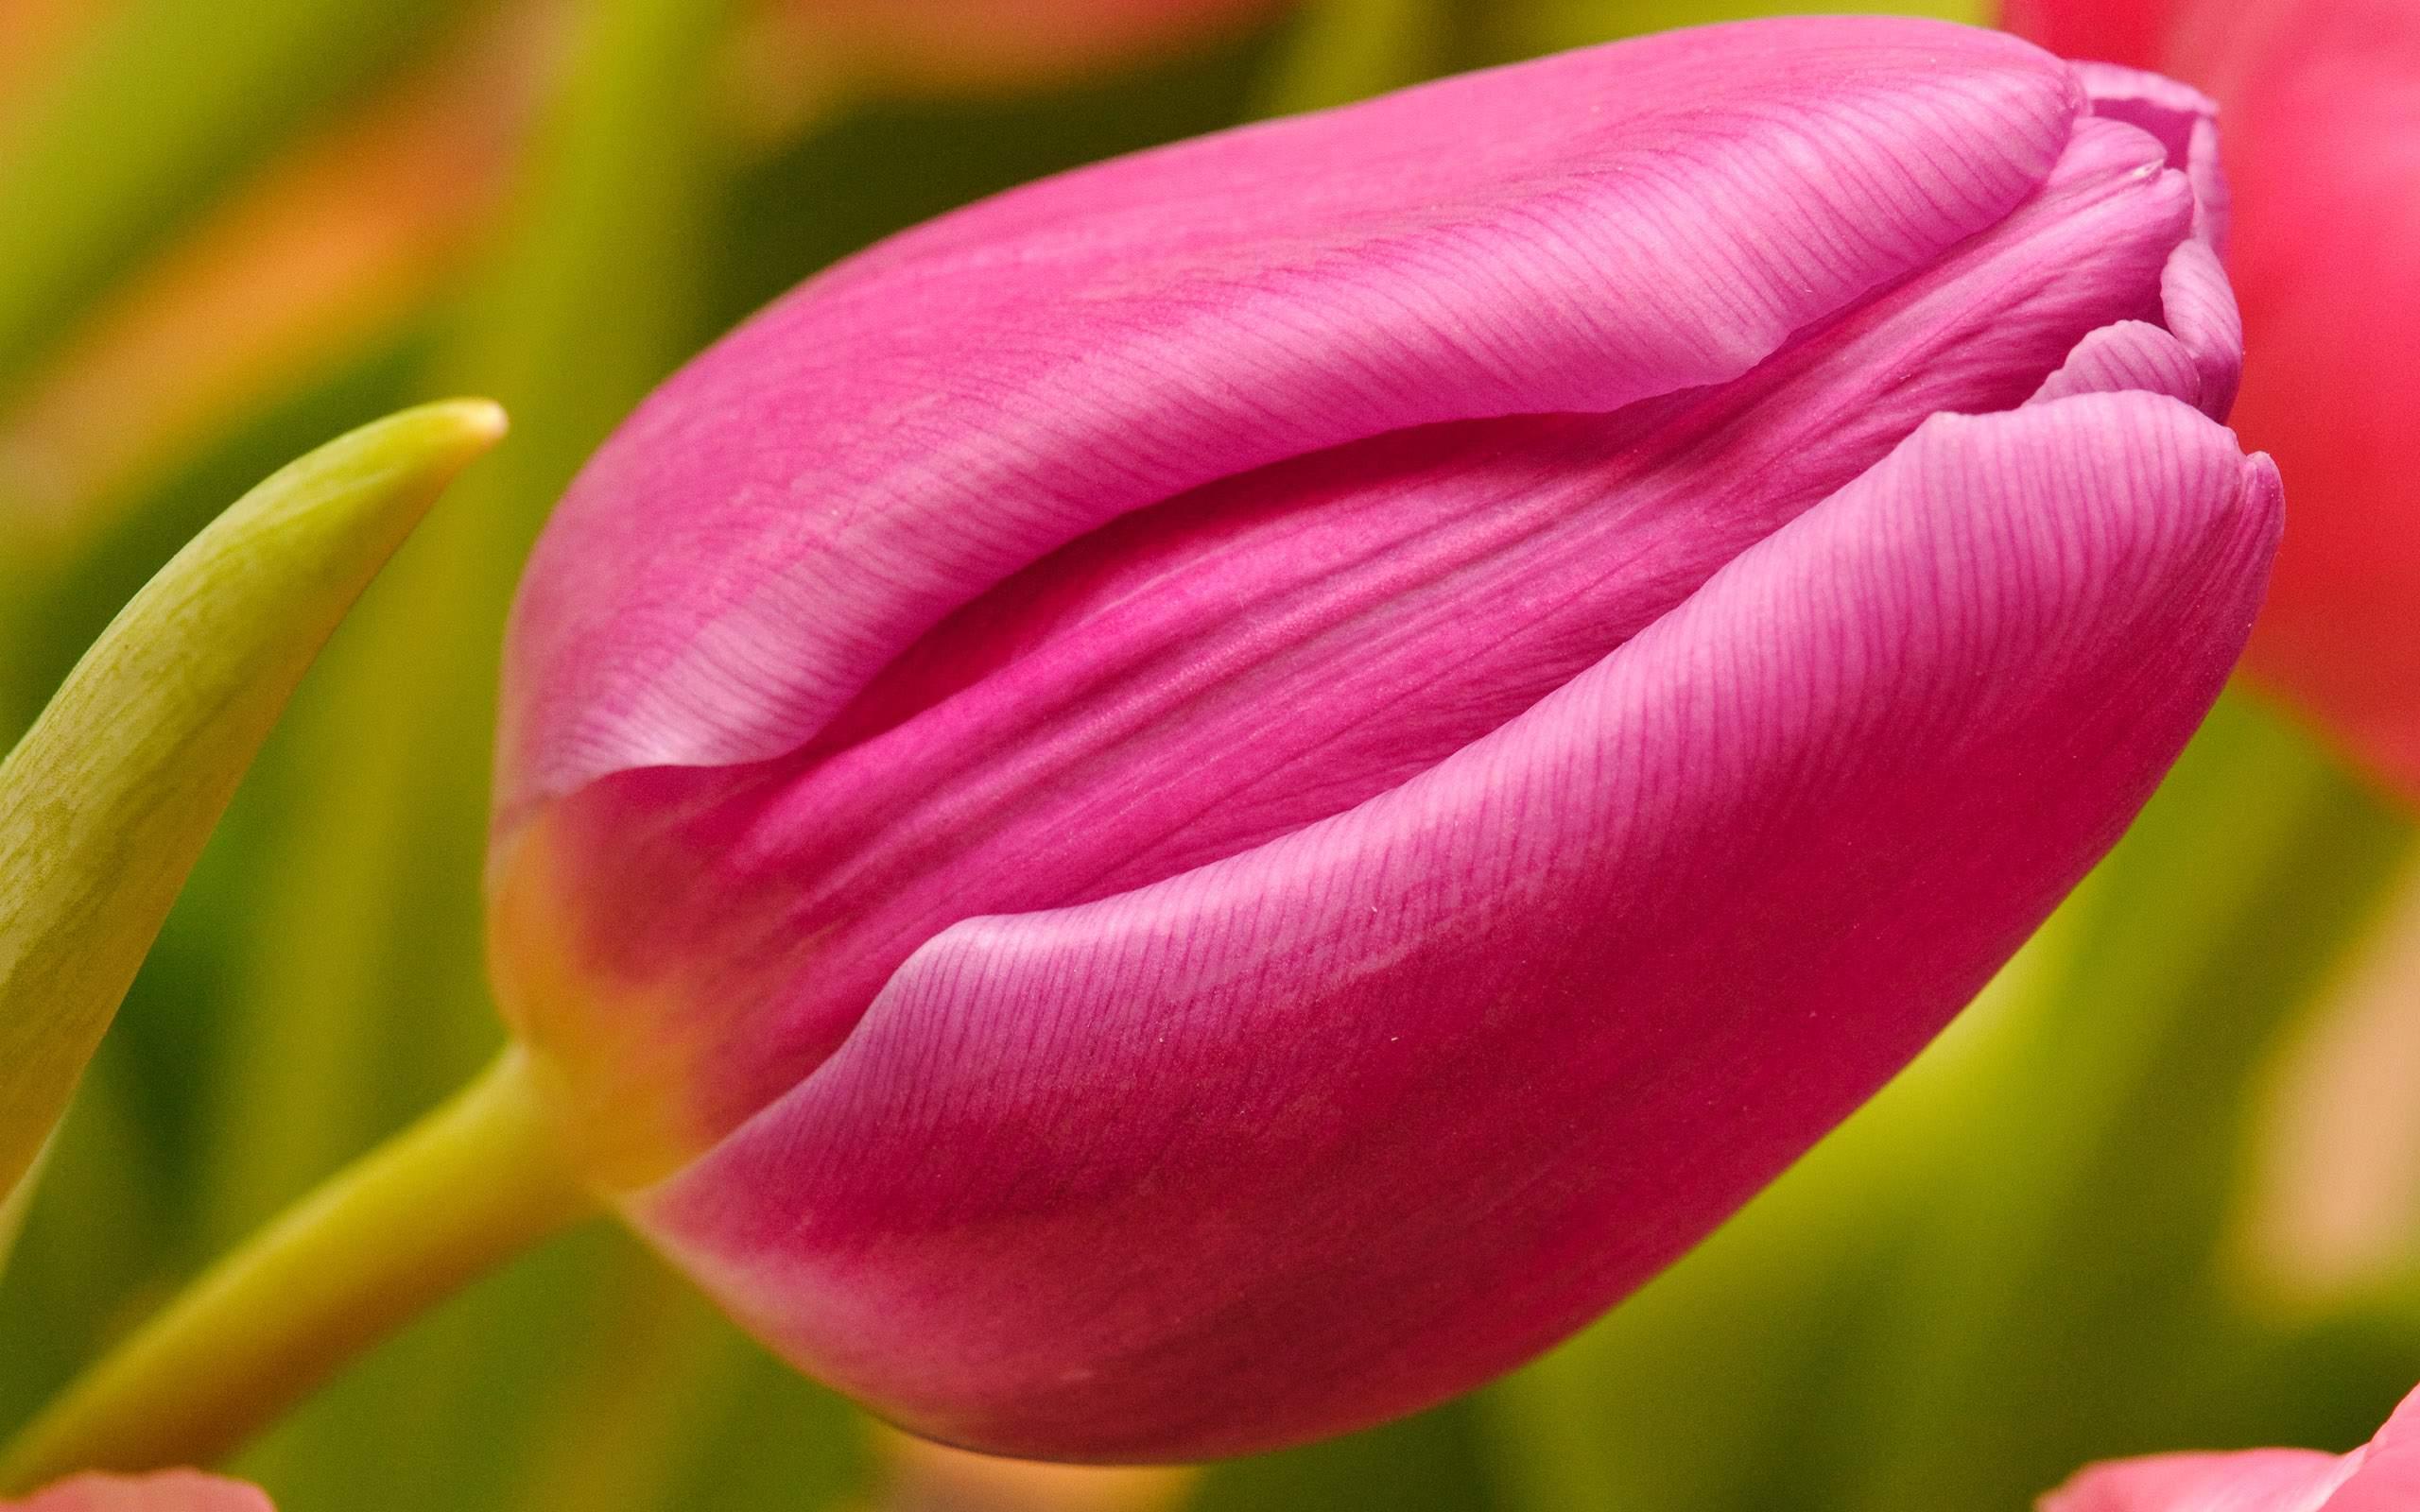 Heart pink tulip